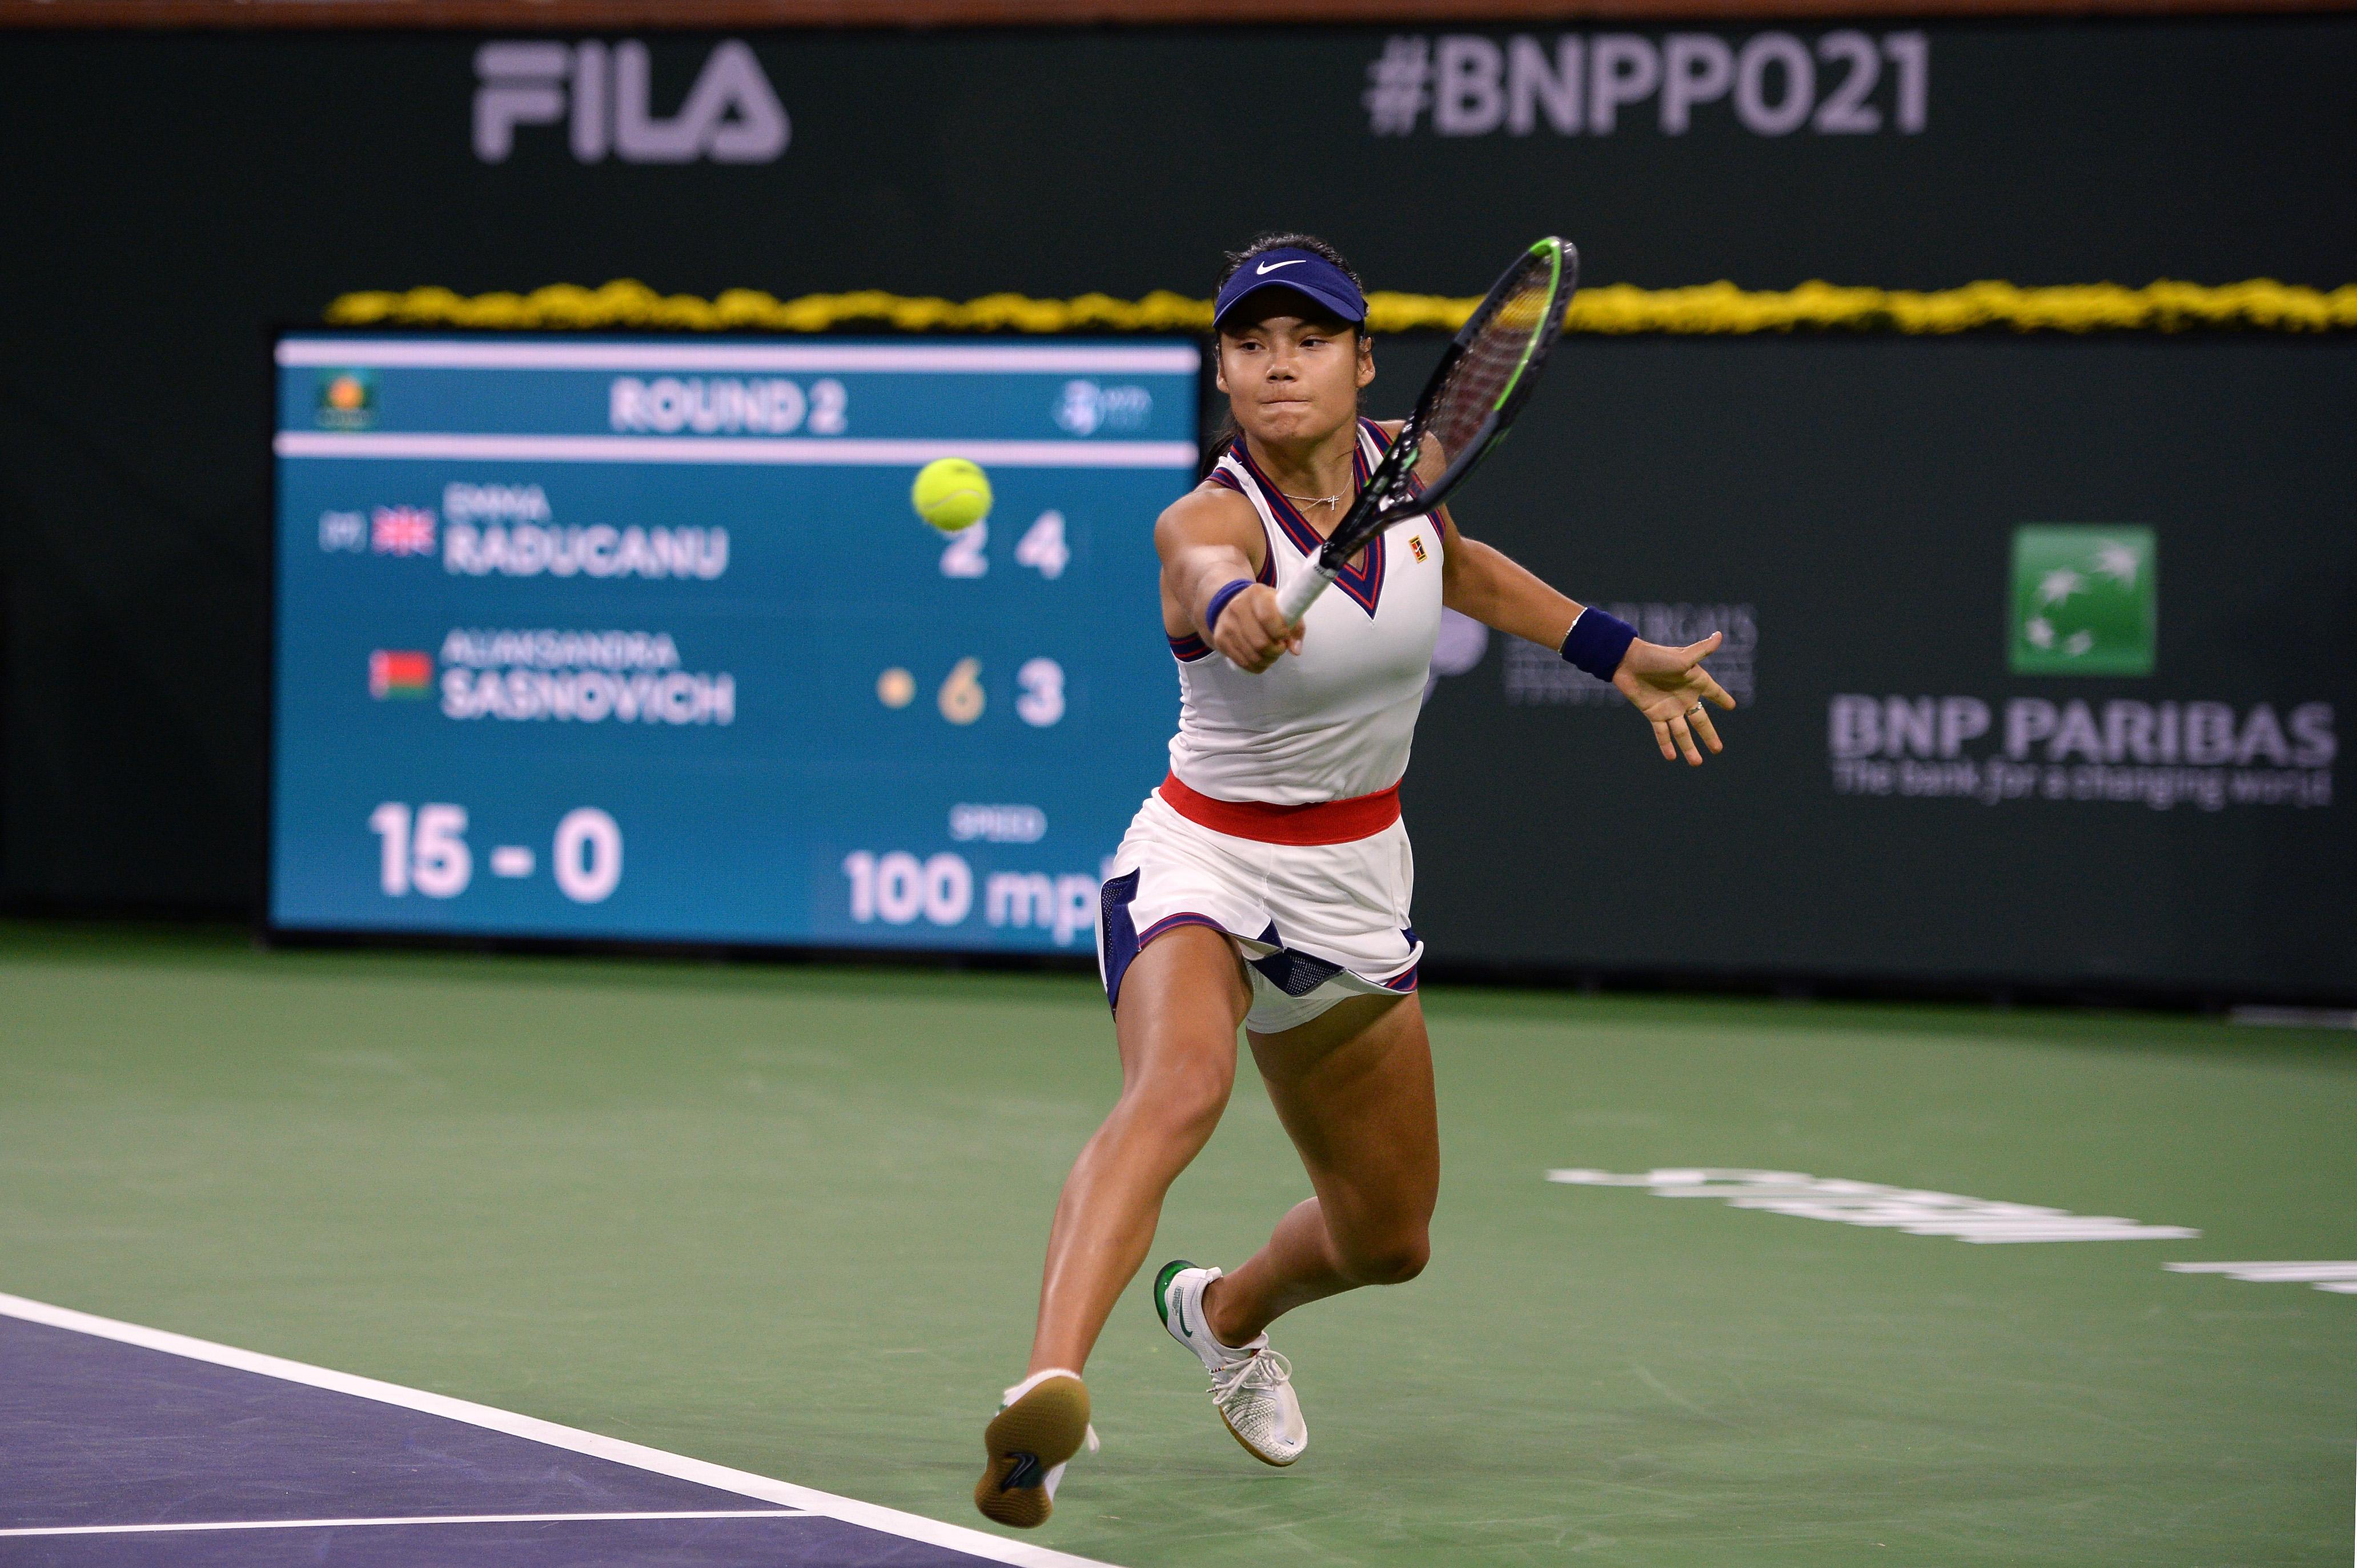 Oct 8, 2021; Indian Wells, CA, USA; Emma Raducanu (GBR) hits a shot against Aliaksandra Sasnovich (BLR) at Indian Wells Tennis Garden. Mandatory Credit: Orlando Ramirez-USA TODAY Sports